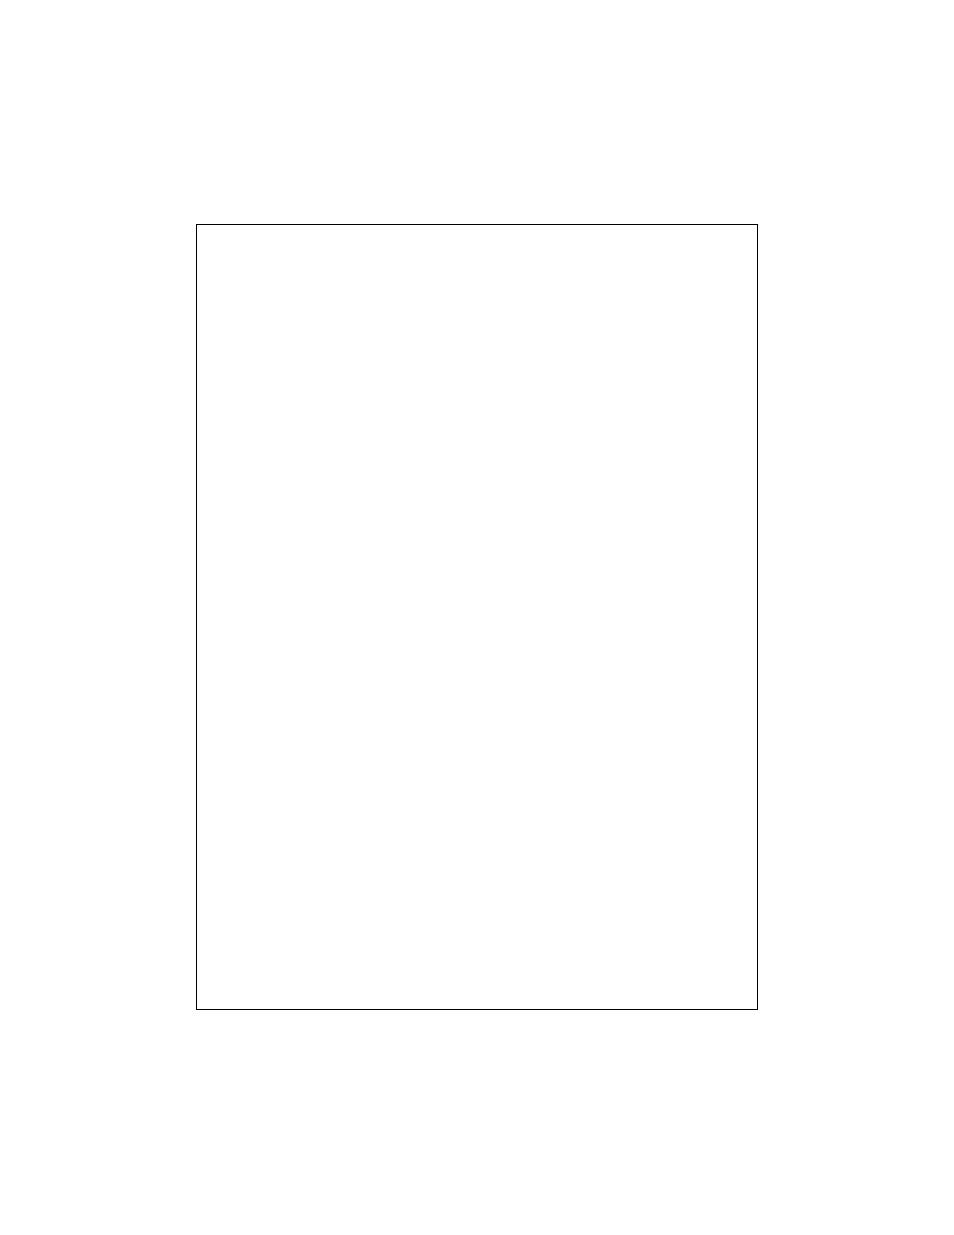 fishfinder l365 raymarine l365 user manual page 2 83 rh manualsdir com